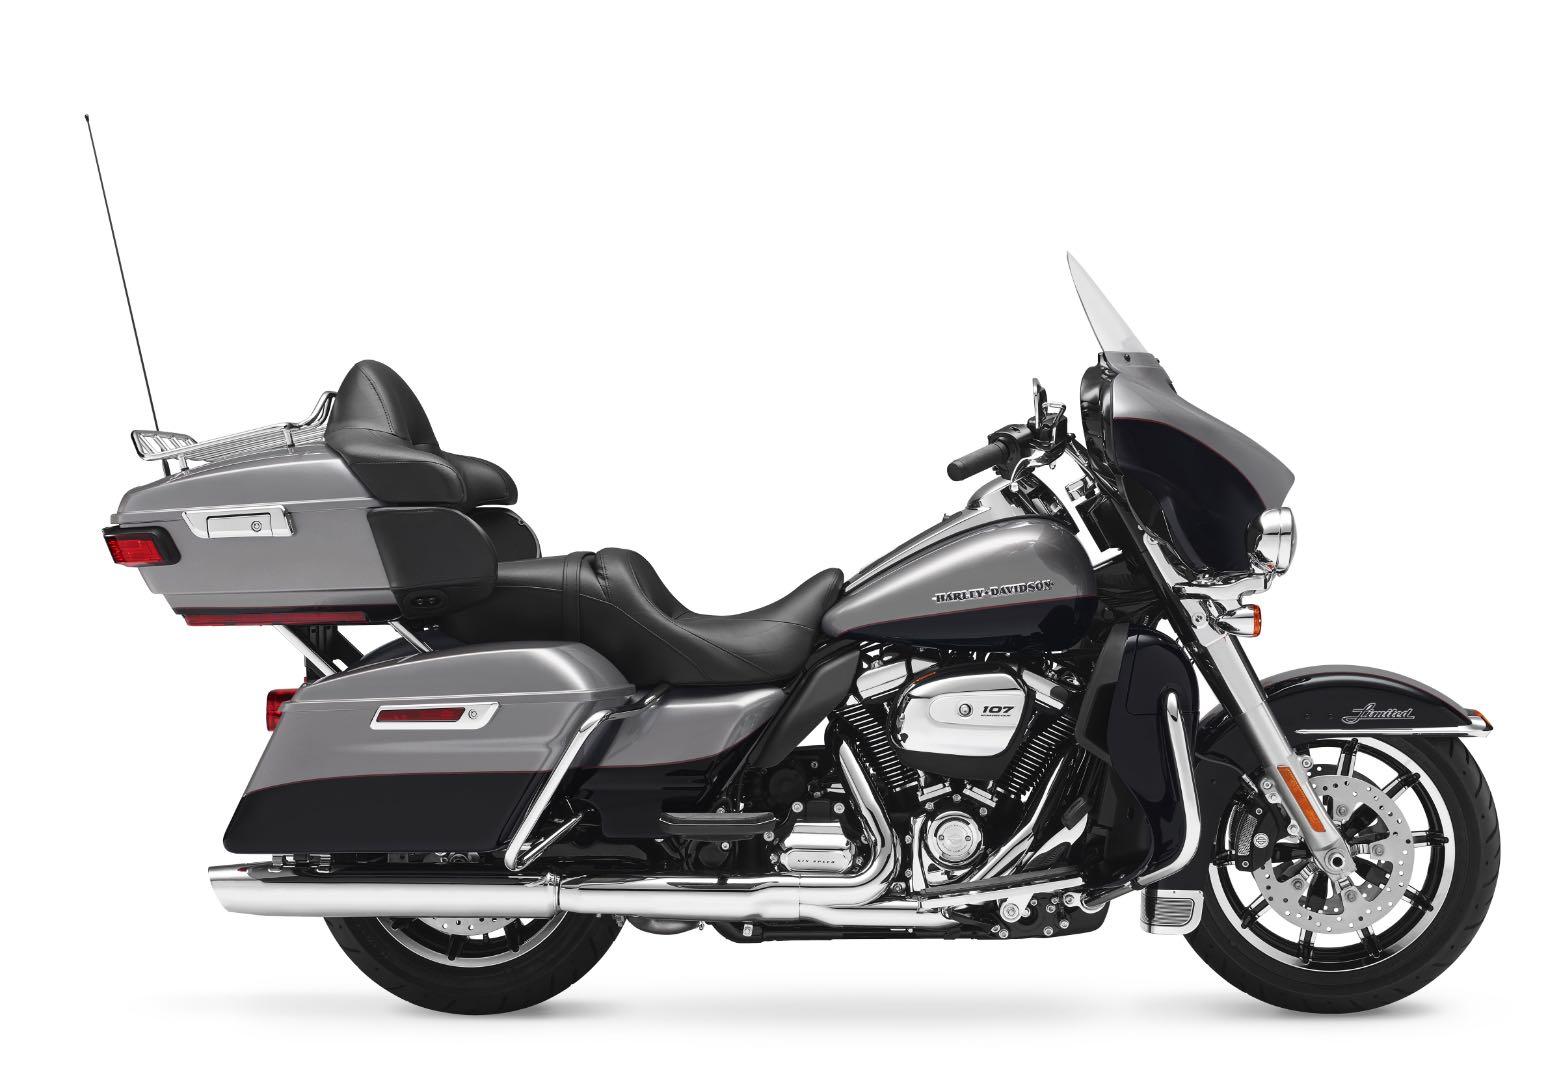 2017 Harley-Davidson Ultra Limited price